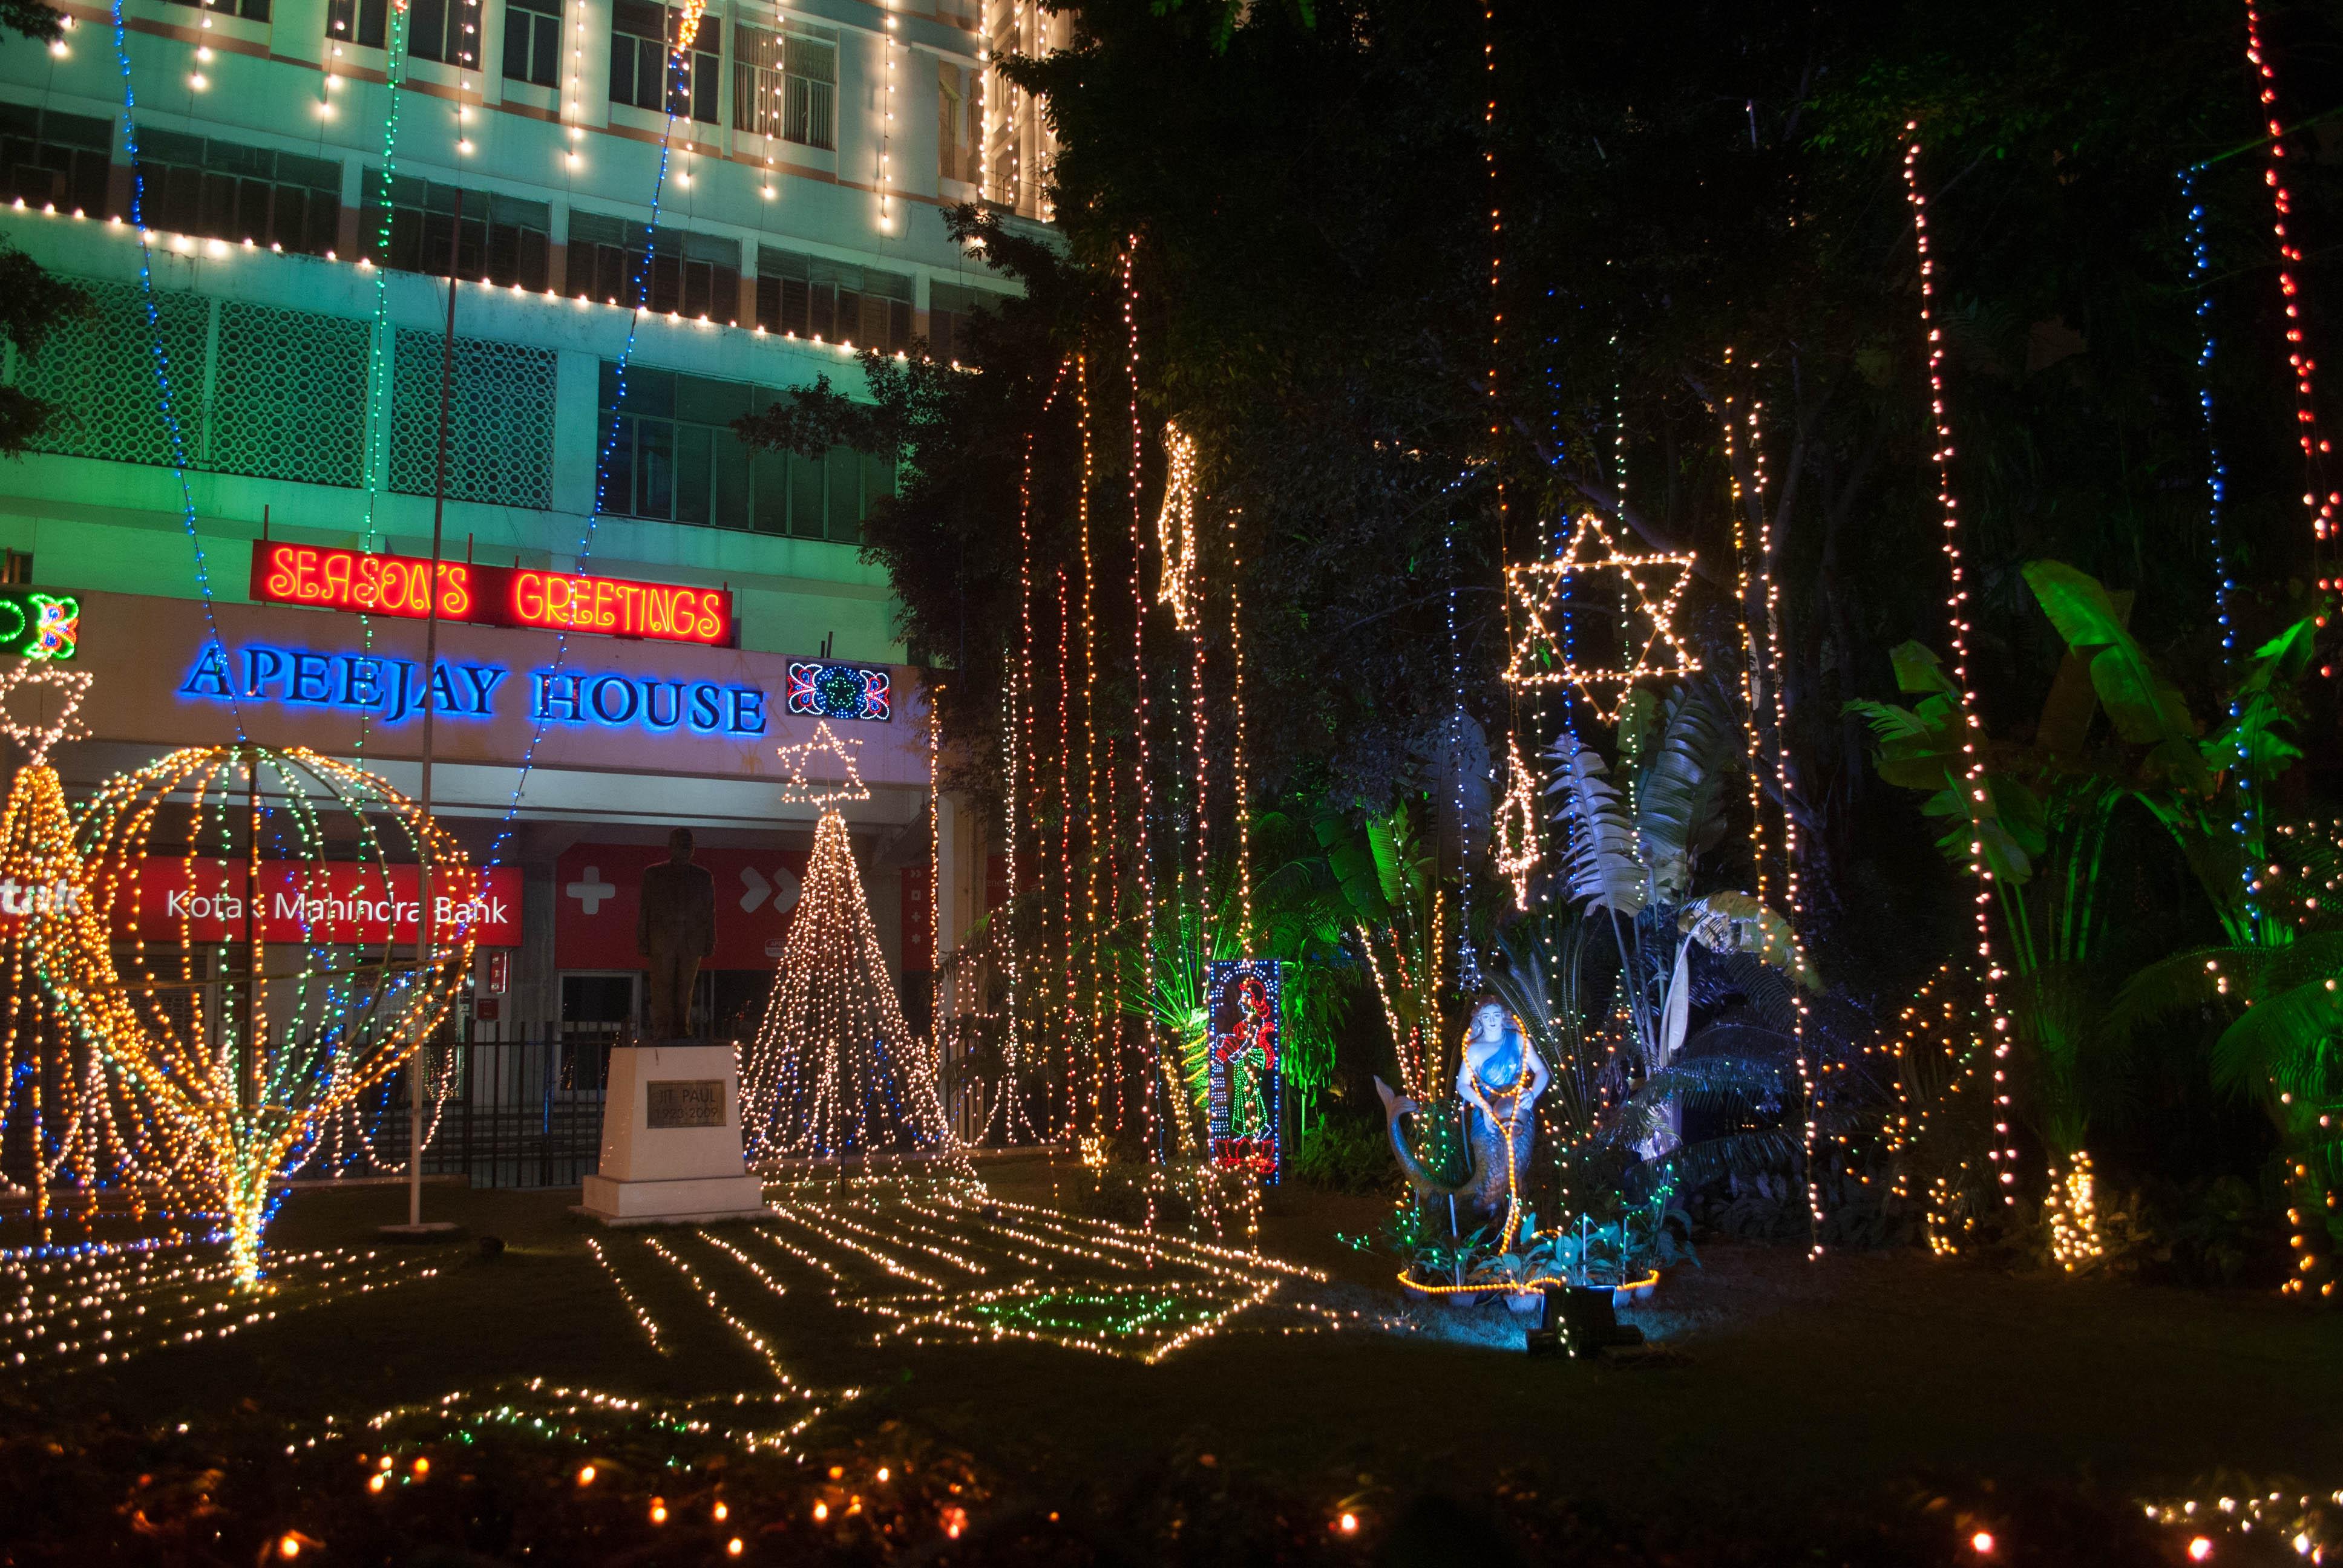 Park Street Kolkata During Christmas.File Chistmas Night Celebration In Apeejay House Park